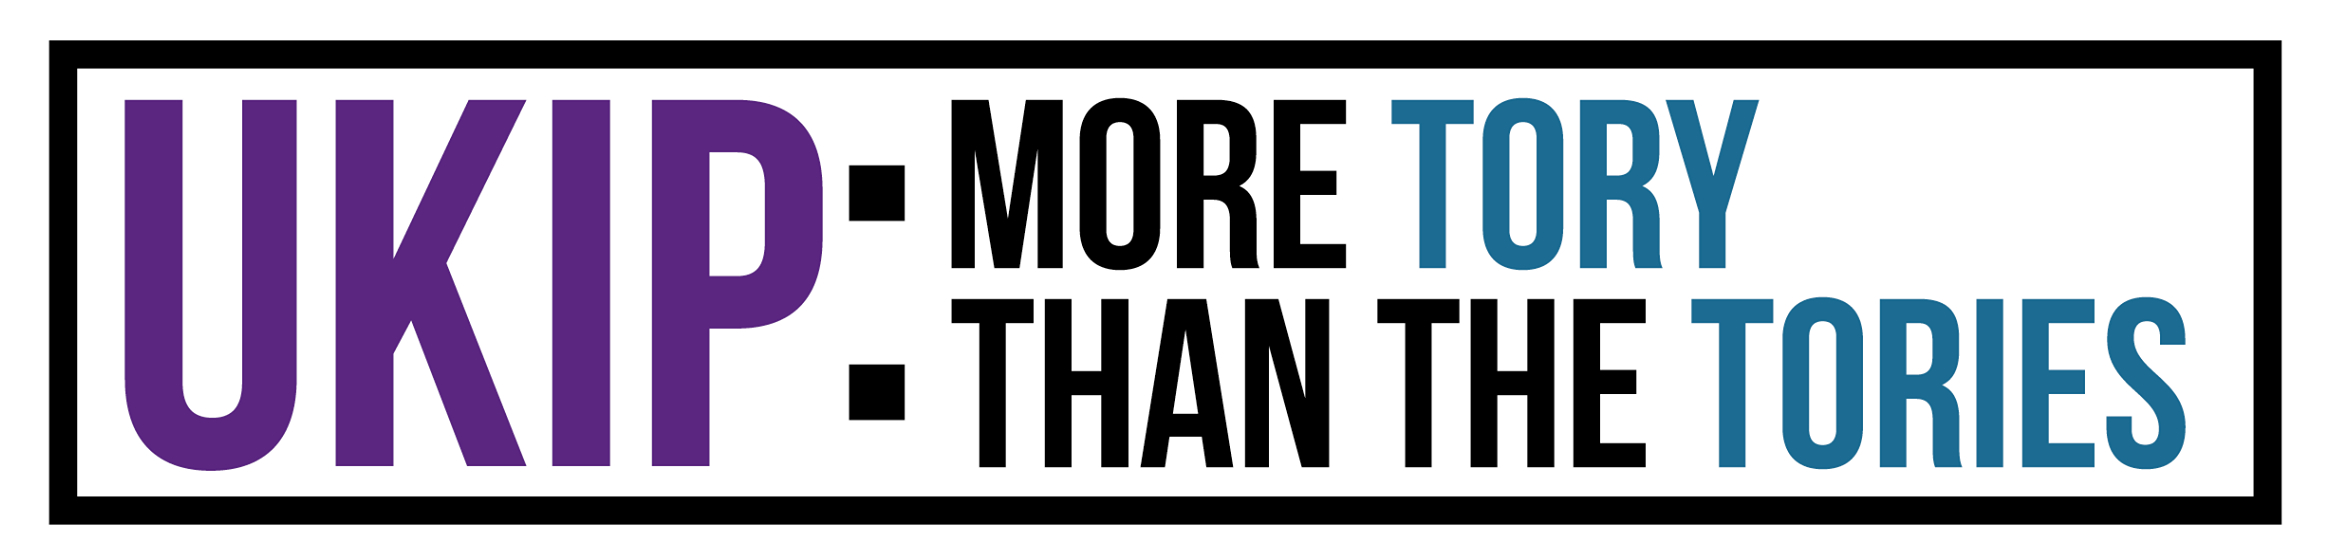 ukip_more_tory_than_the_tories.jpg